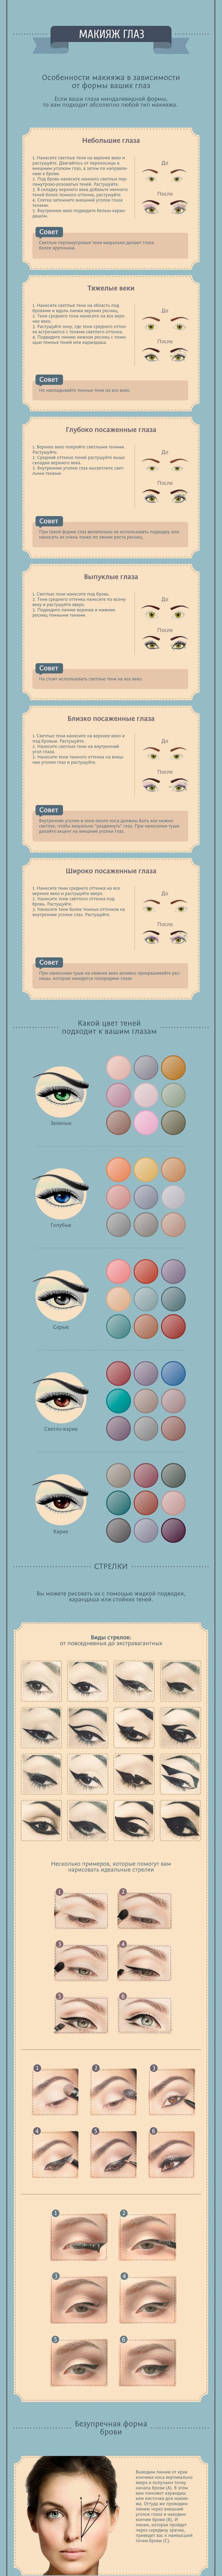 макияж-схема-самая-подробная2.jpg